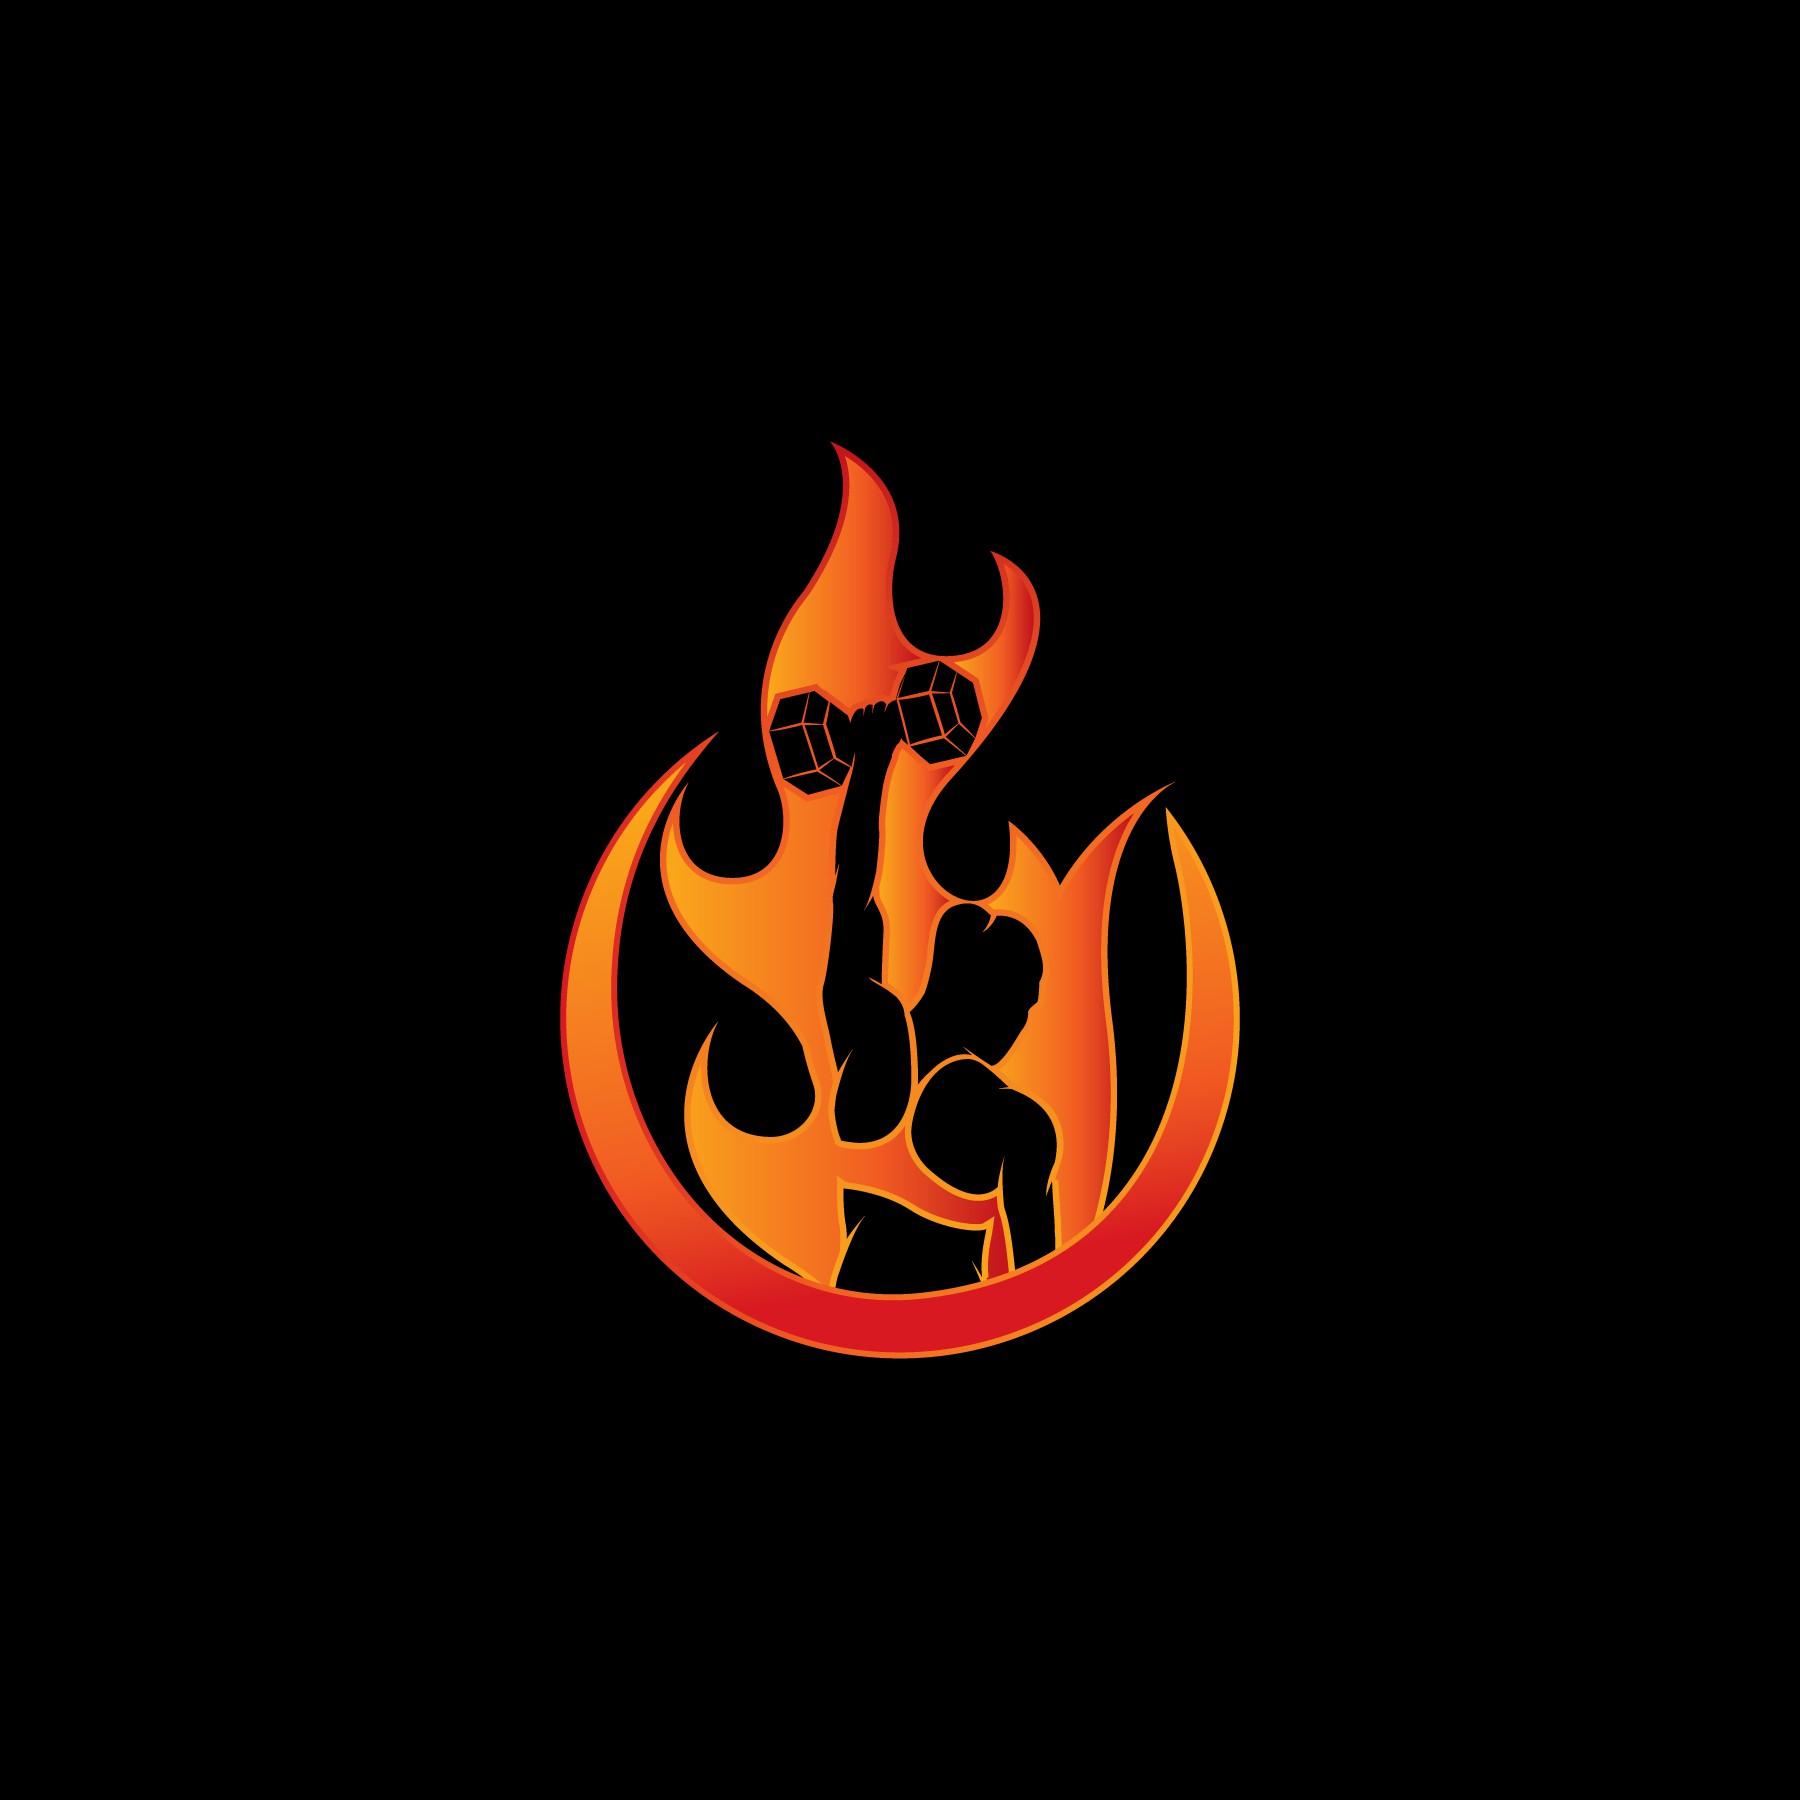 #mustlovefire